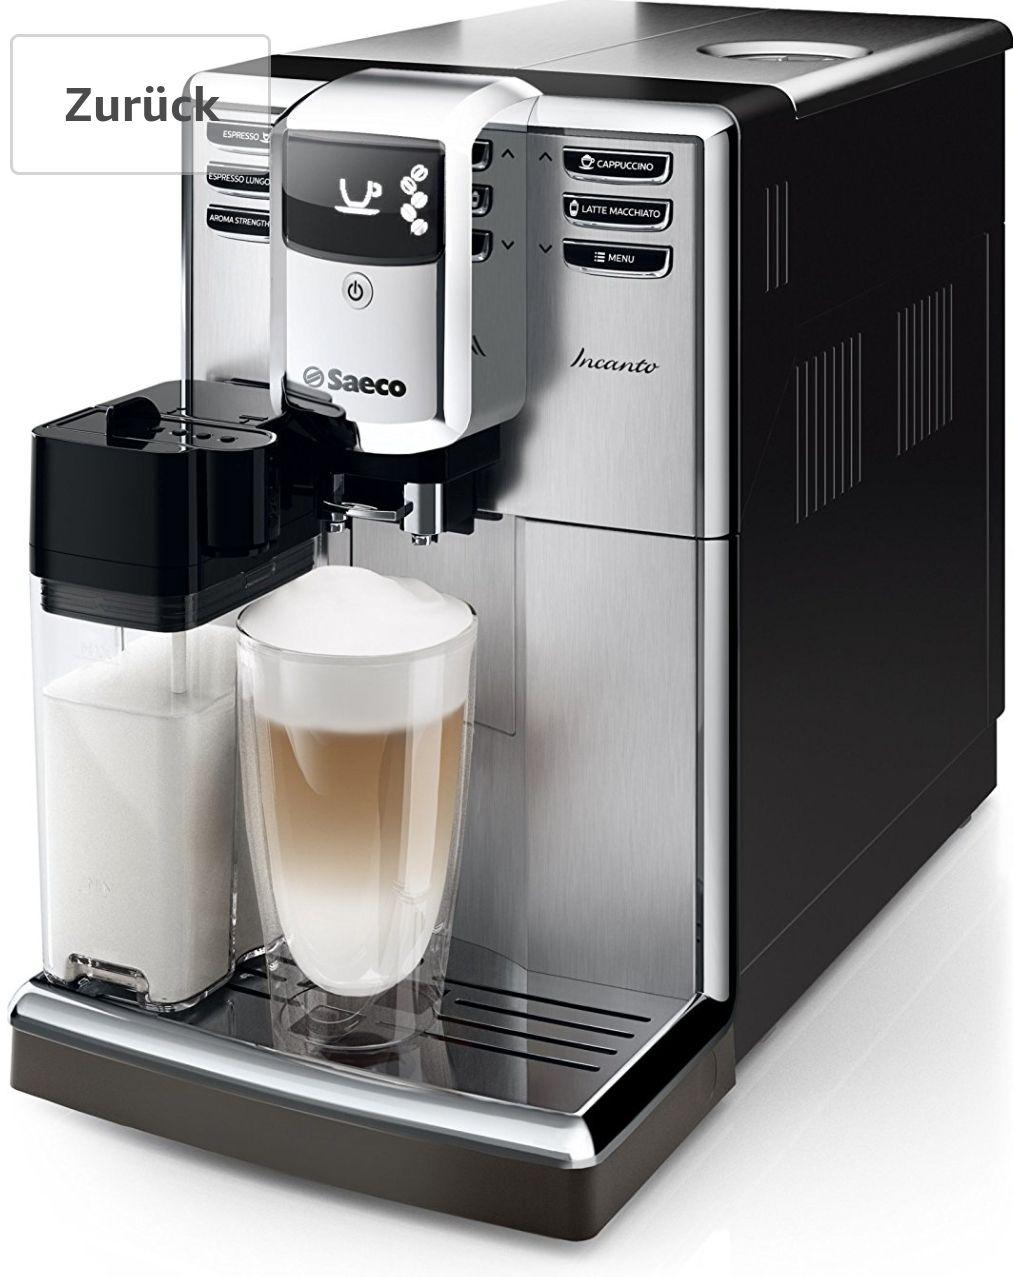 (Amazon Blitzangebot) Saeco Incanto 8917/01 Kaffeevollautomat